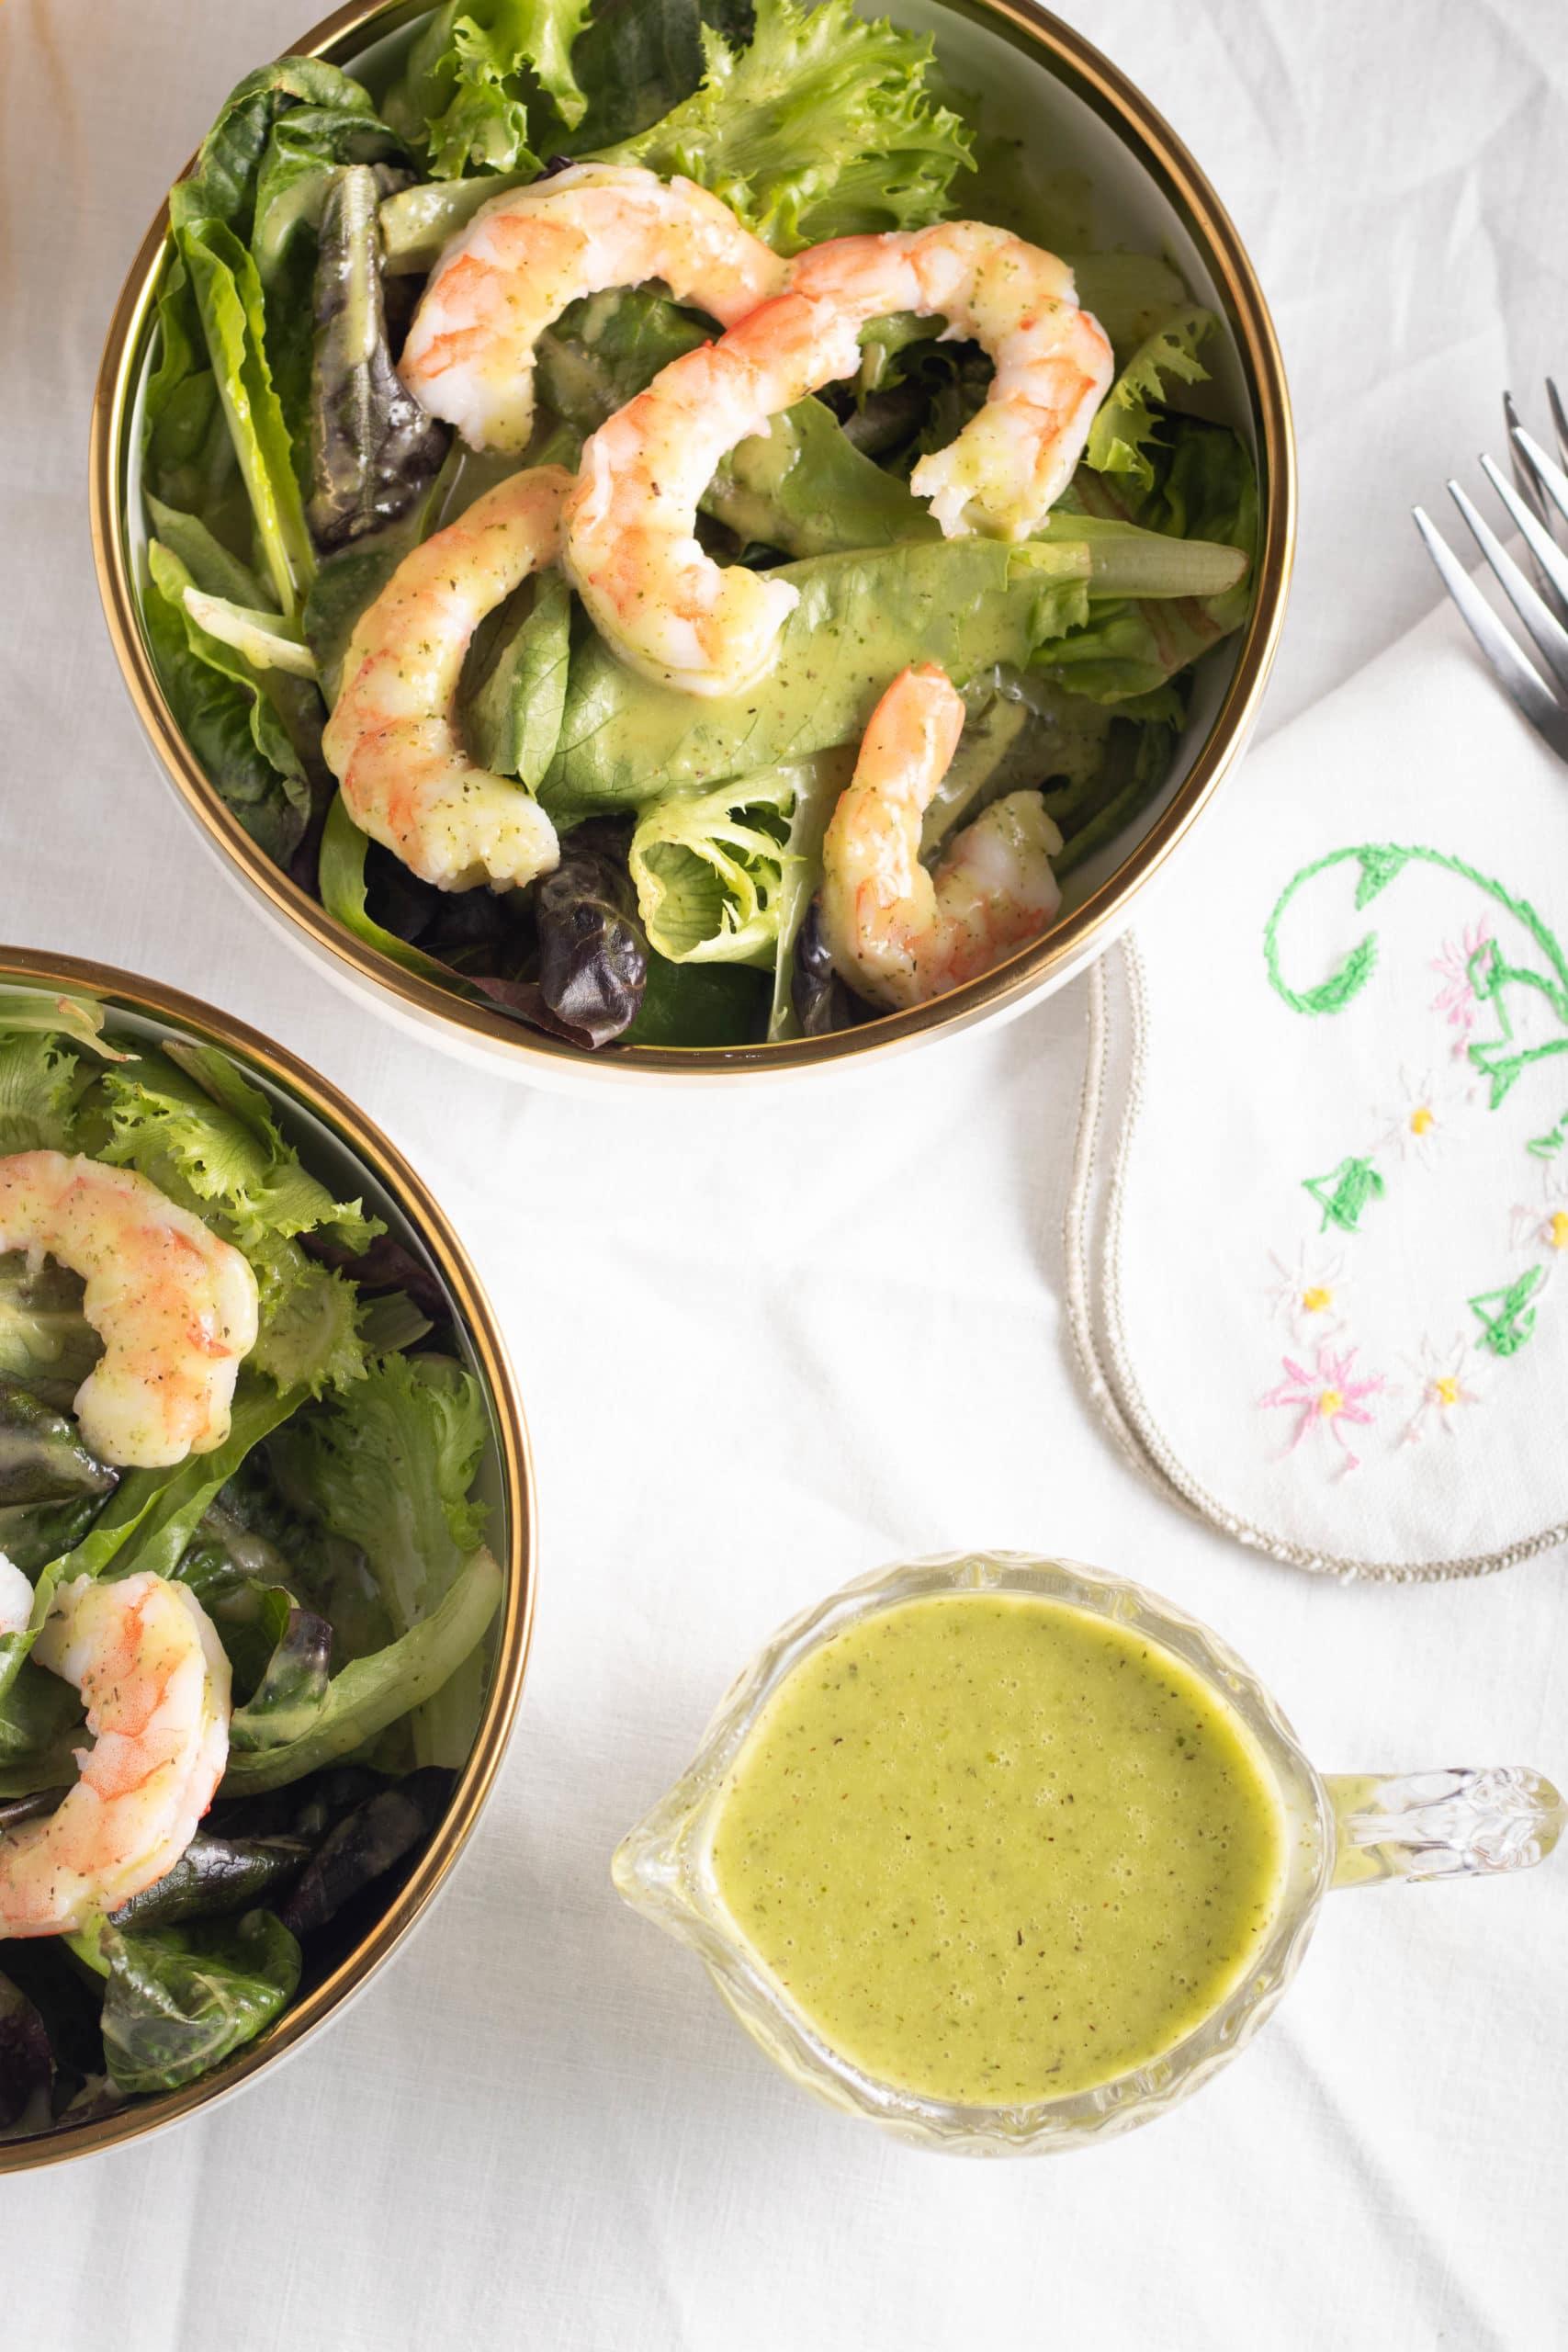 Garlic and herb vinaigrette low carb salad dressing.